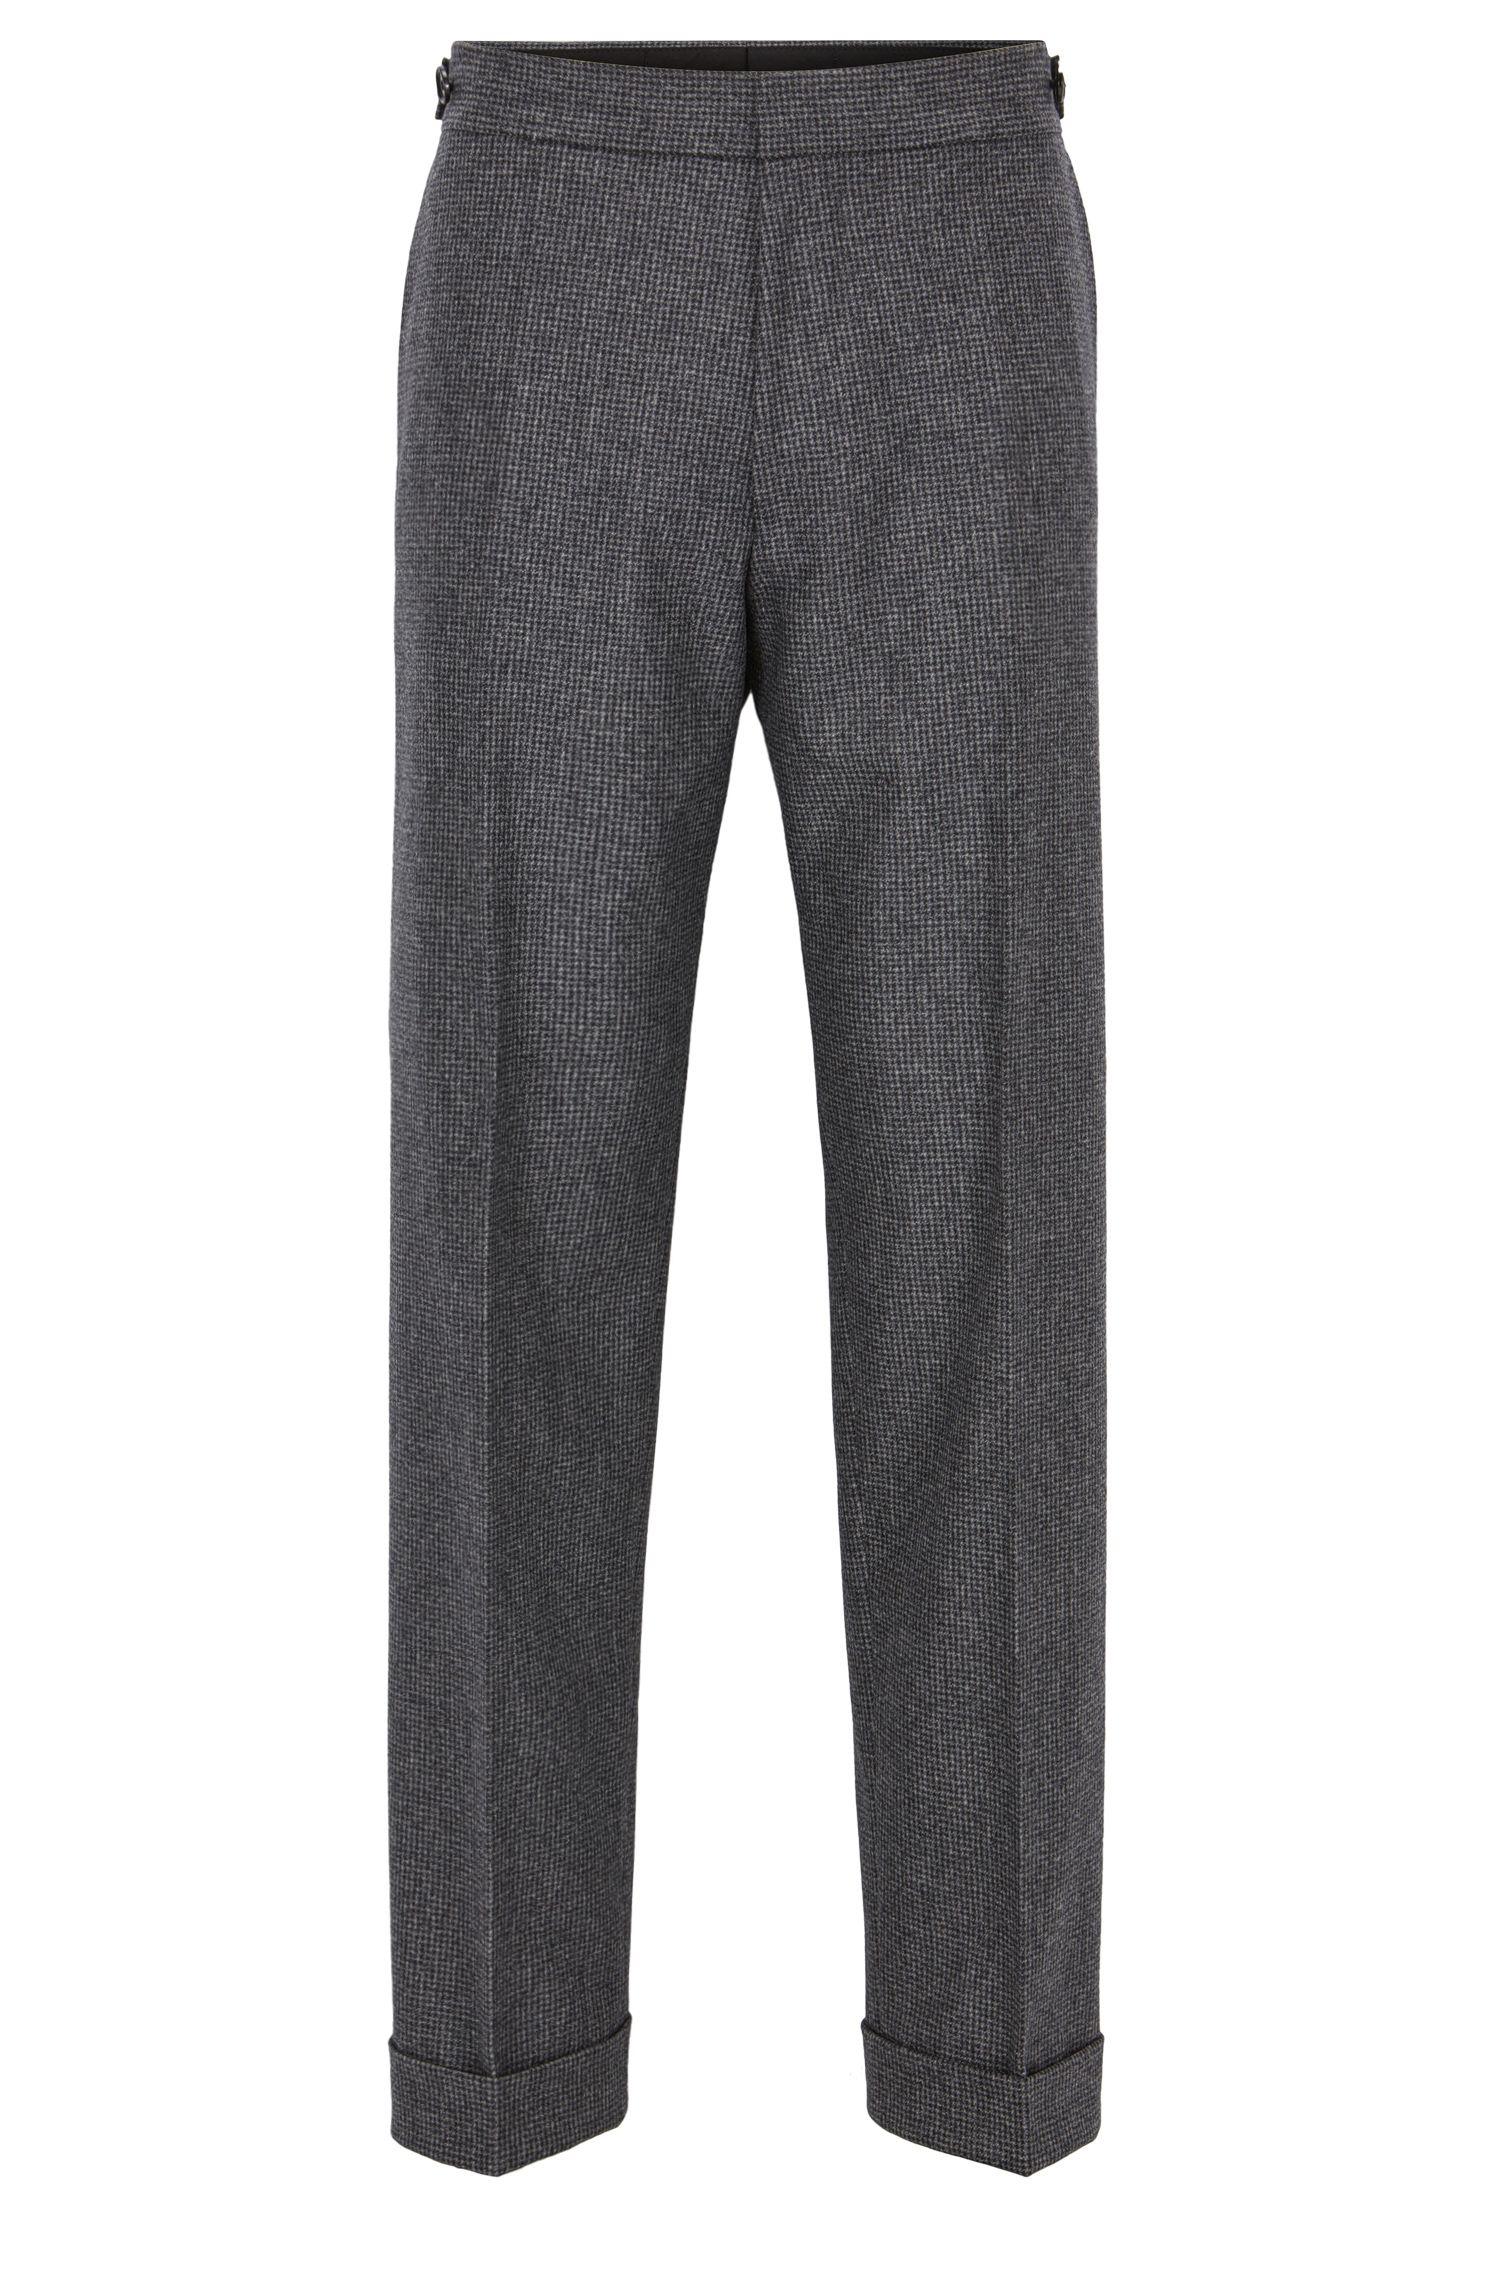 Pantaloni relaxed fit in lana vergine con motivo pied de poule